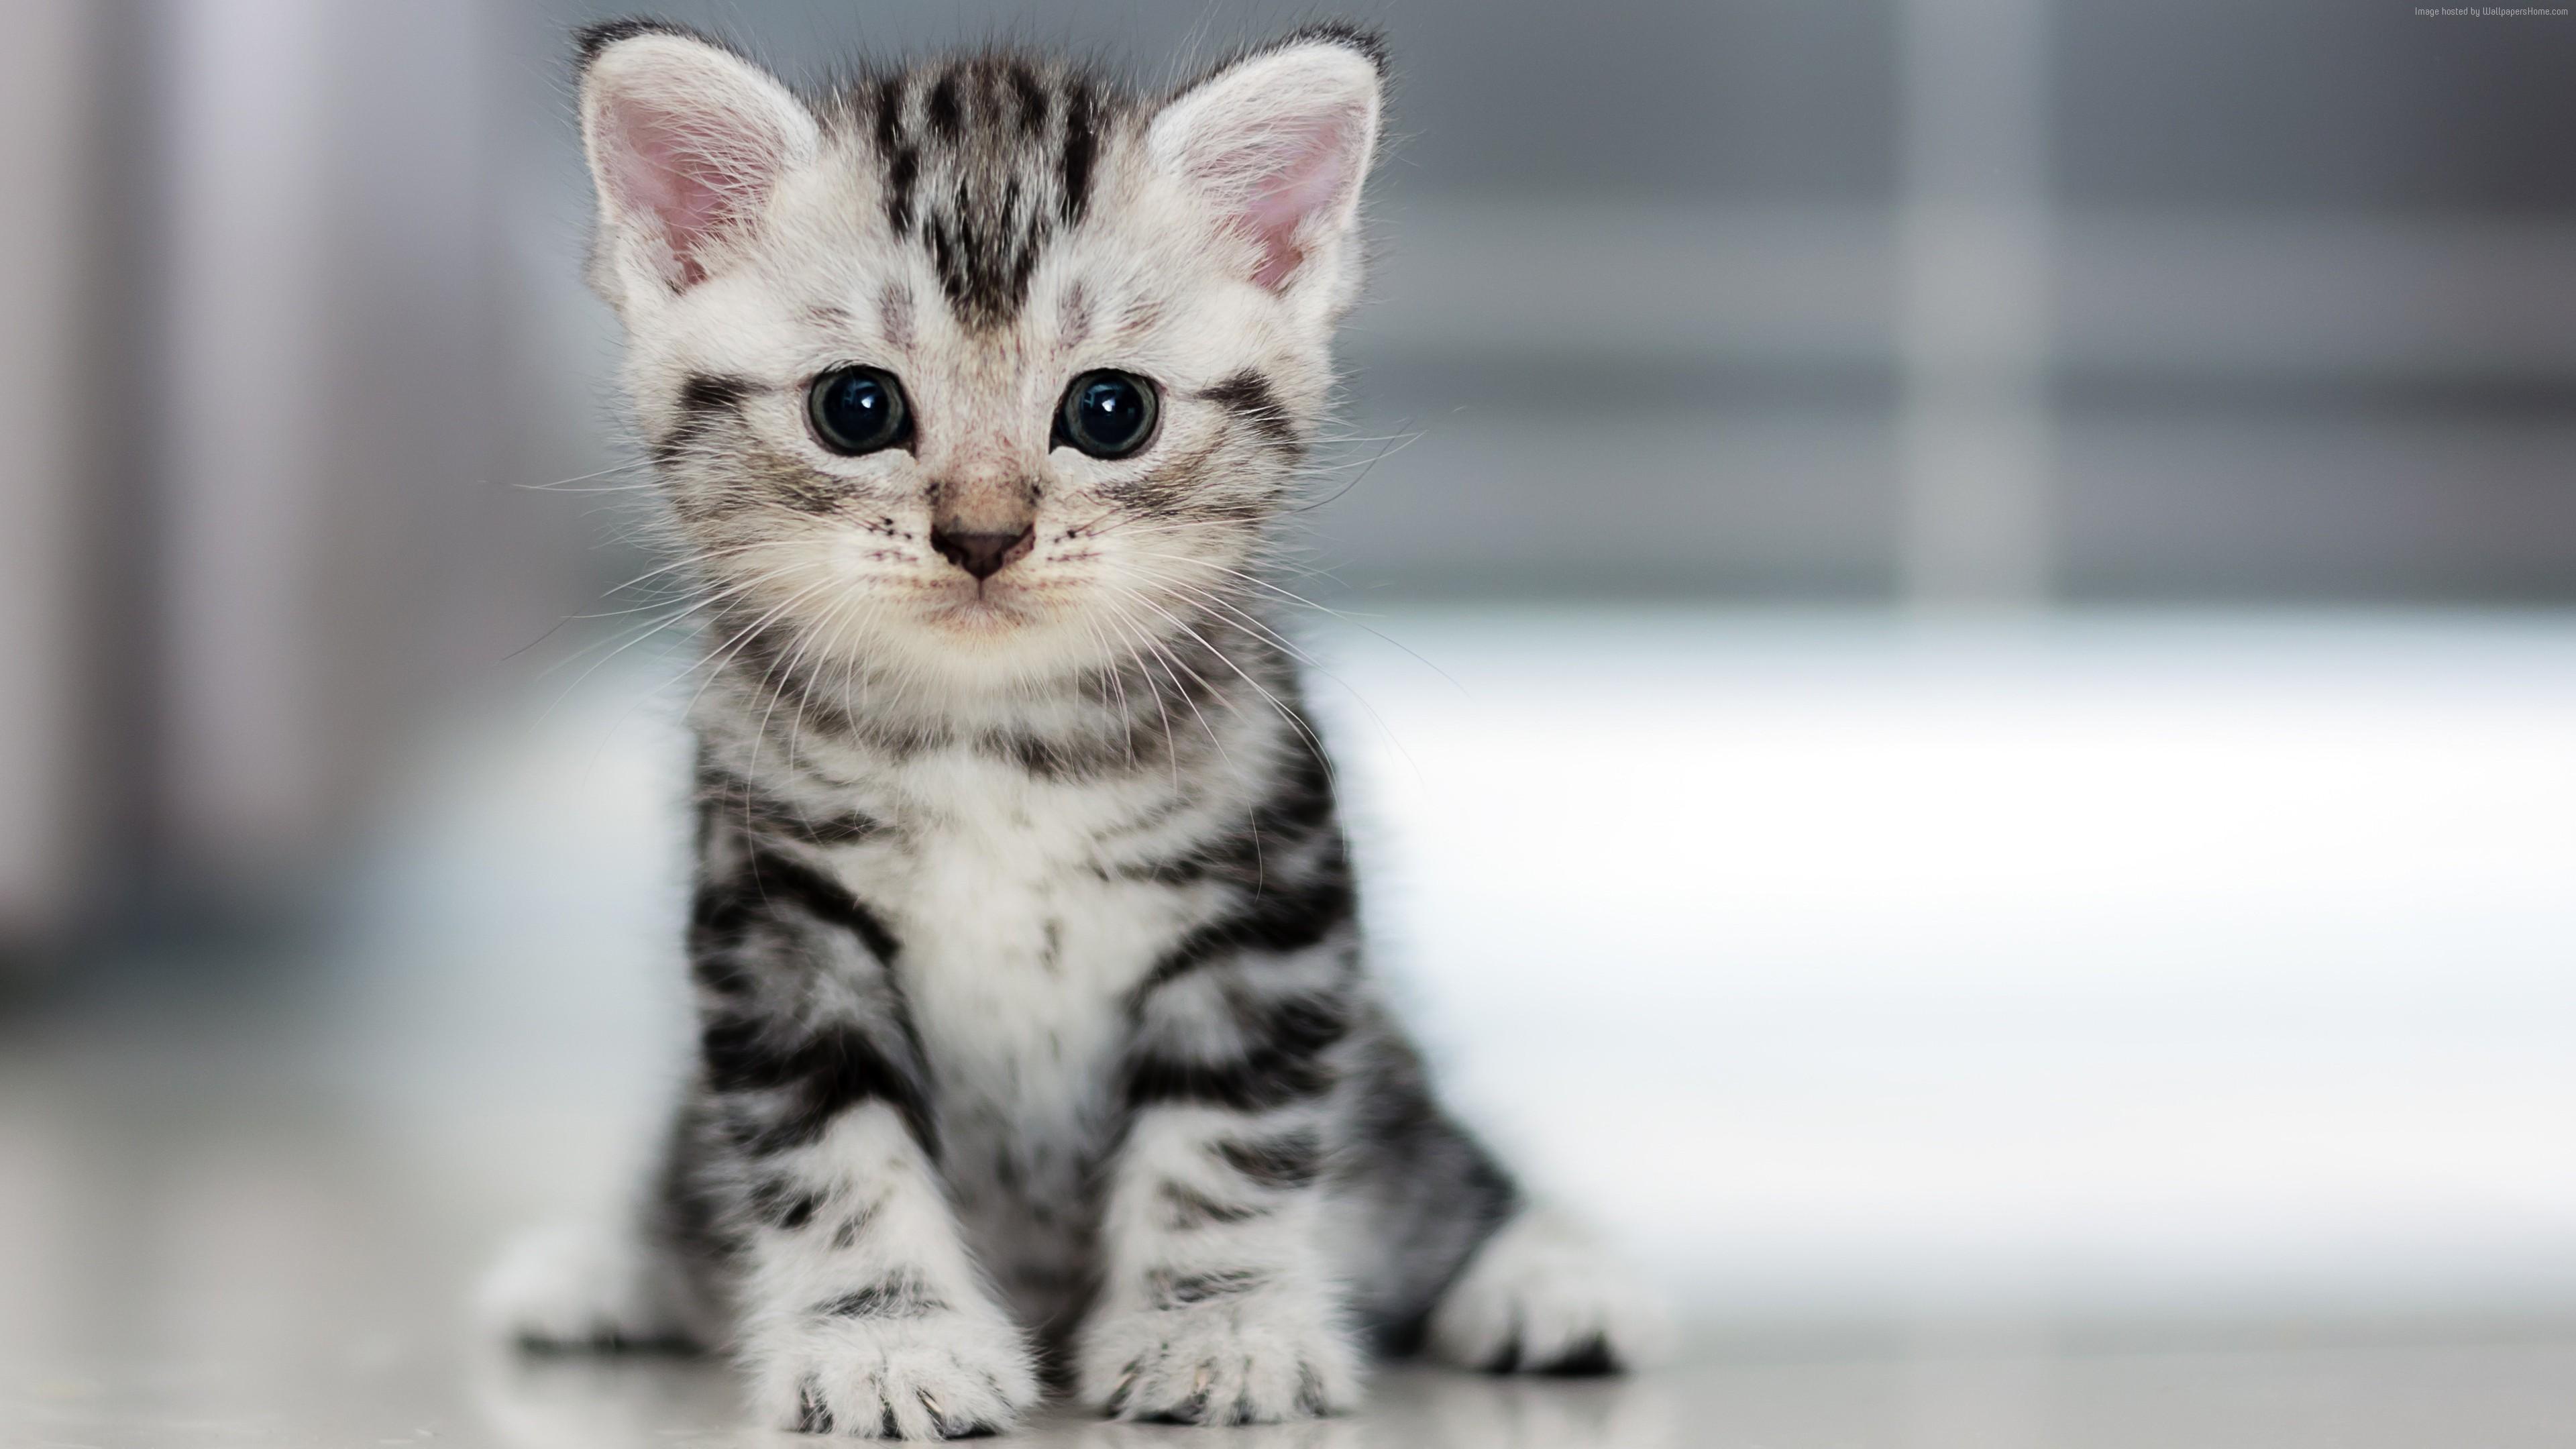 Wallpaper Kitten Cat Cute 4k Animals Wallpaper Download High Resolution 4k Wallpaper